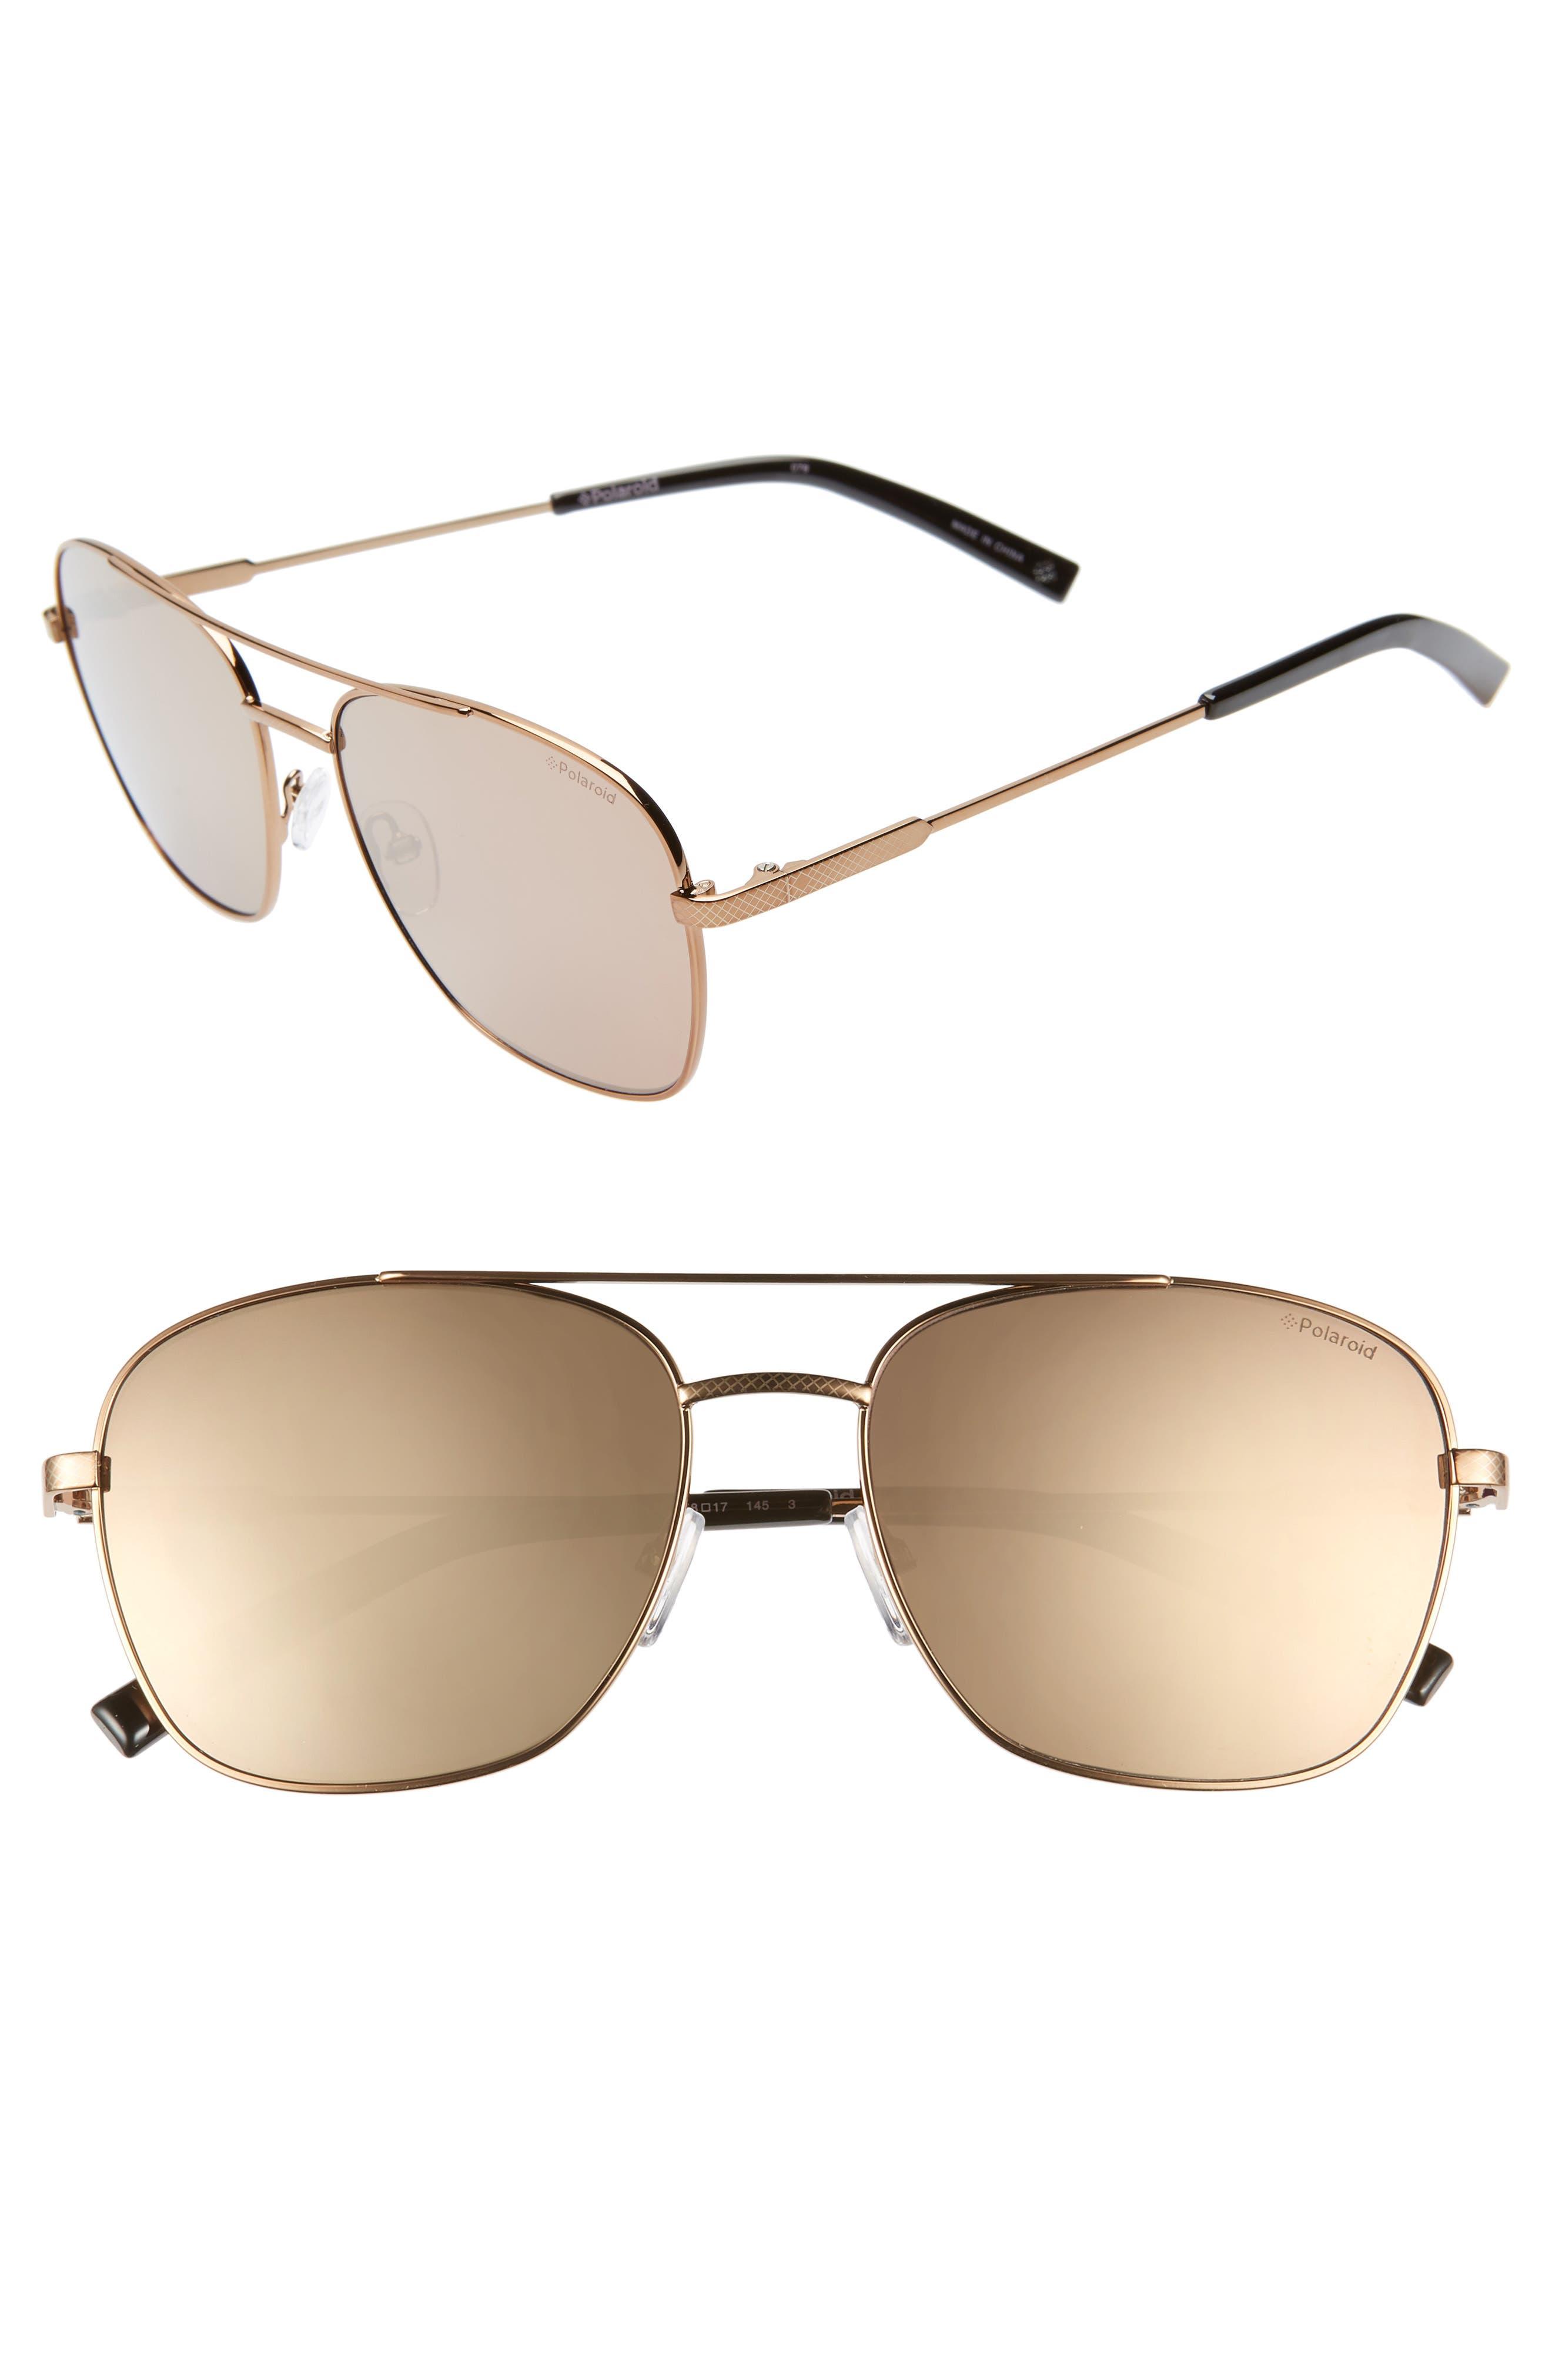 POLAROID Polarioid 58Mm Polarized Navigator Sunglasses - Bronze